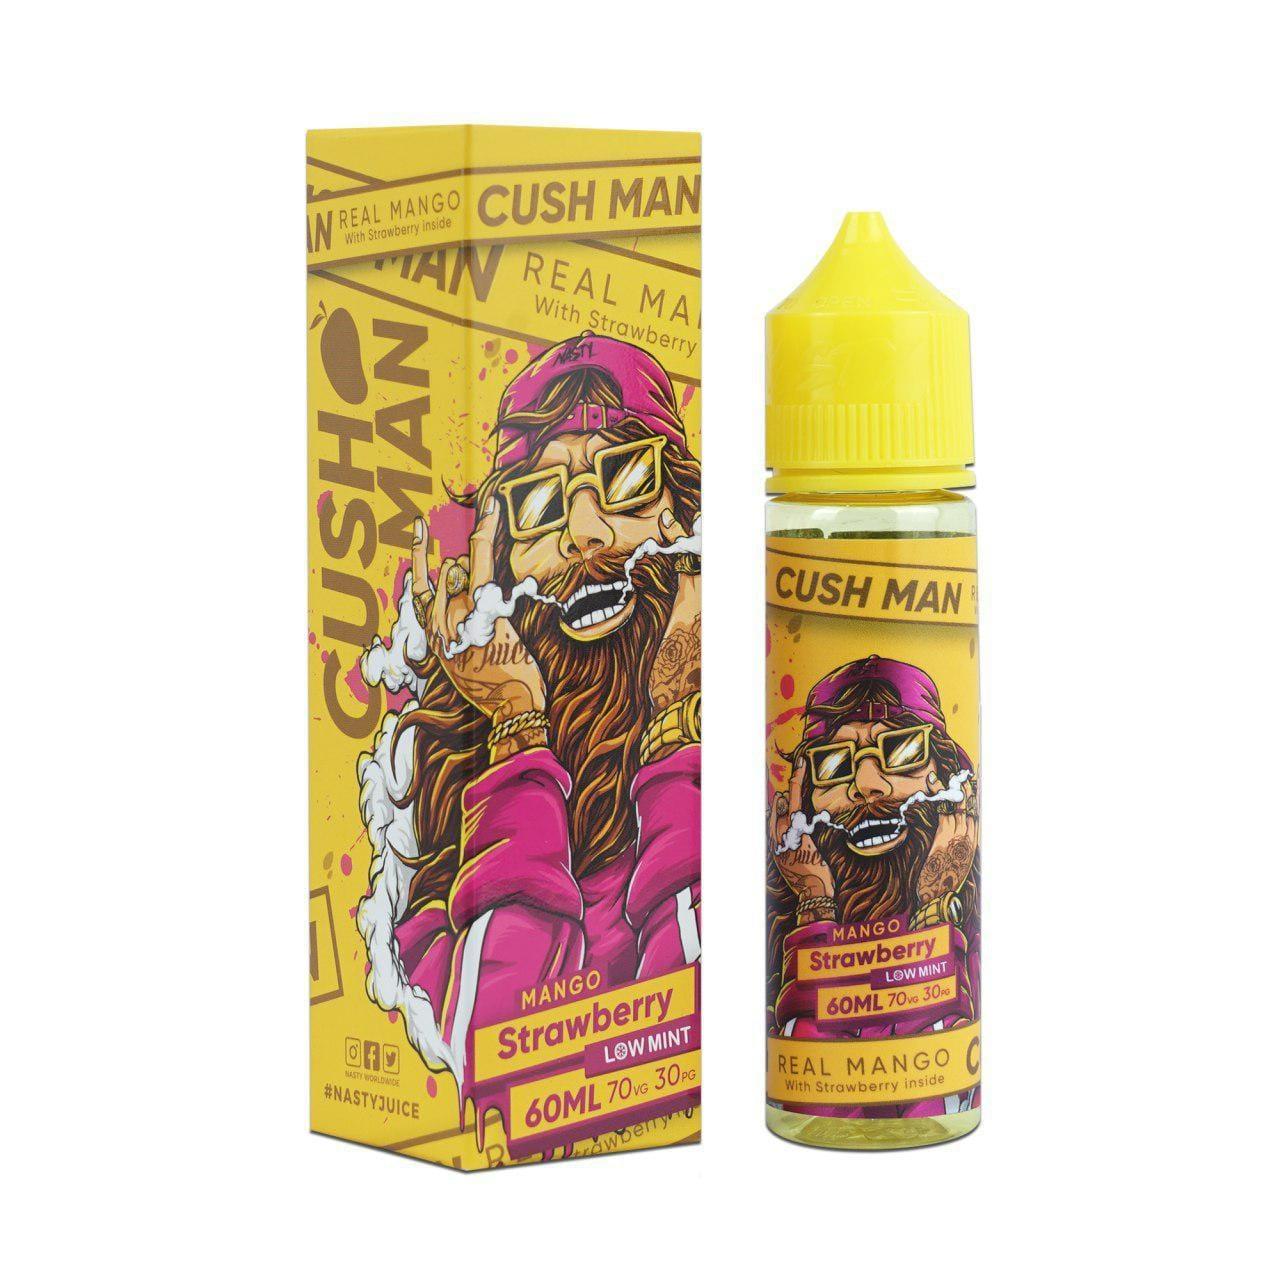 Nasty Vape Juice Cush Man Series Mango Strawberry 60ml